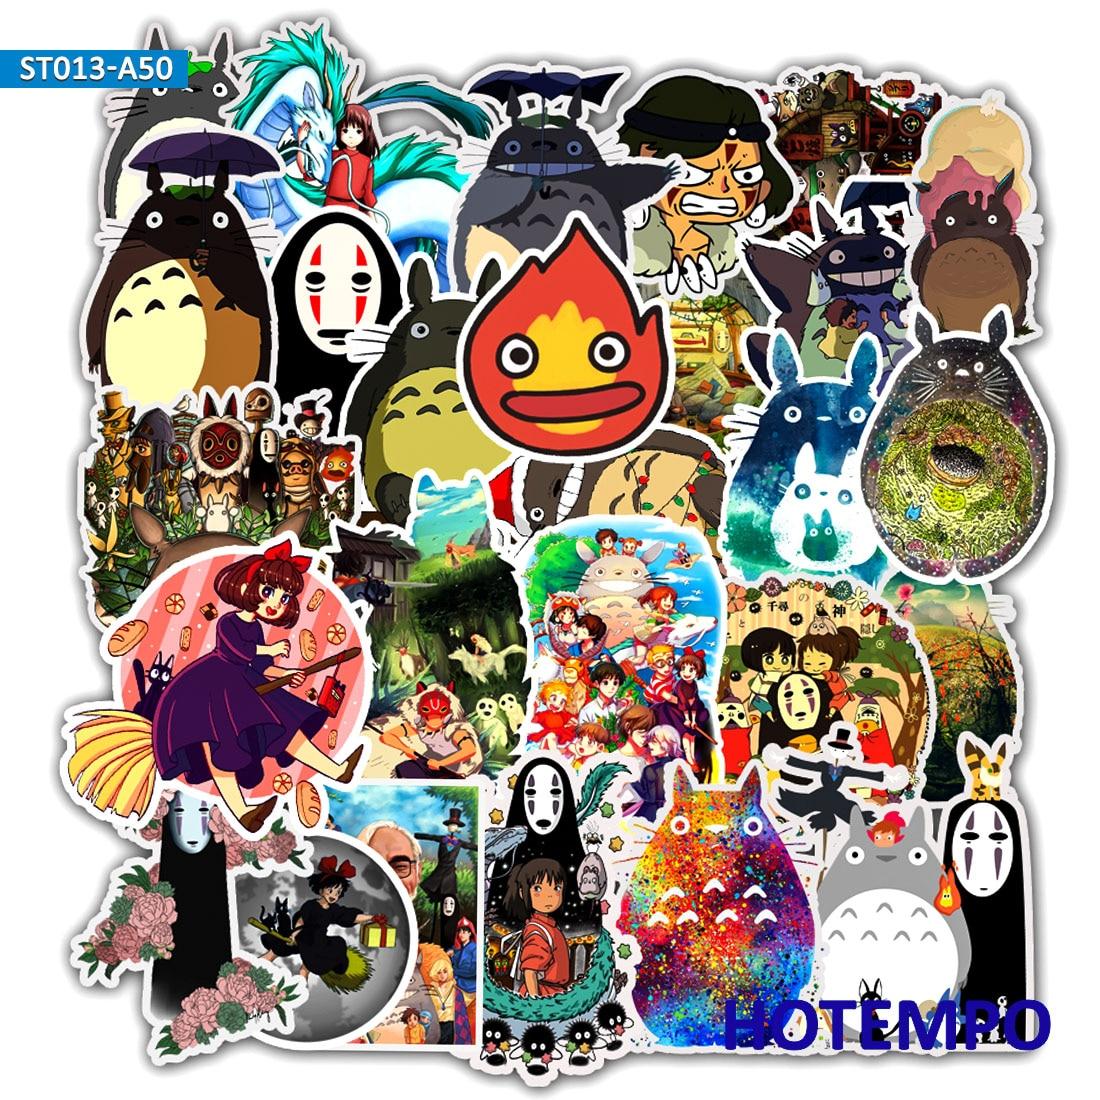 50pcs Anime Manga Miyazaki Hayao Cartoon Stickers For Mobile Phone Laptop Luggage Suitcase Guitar Skateboard Decal Stickers